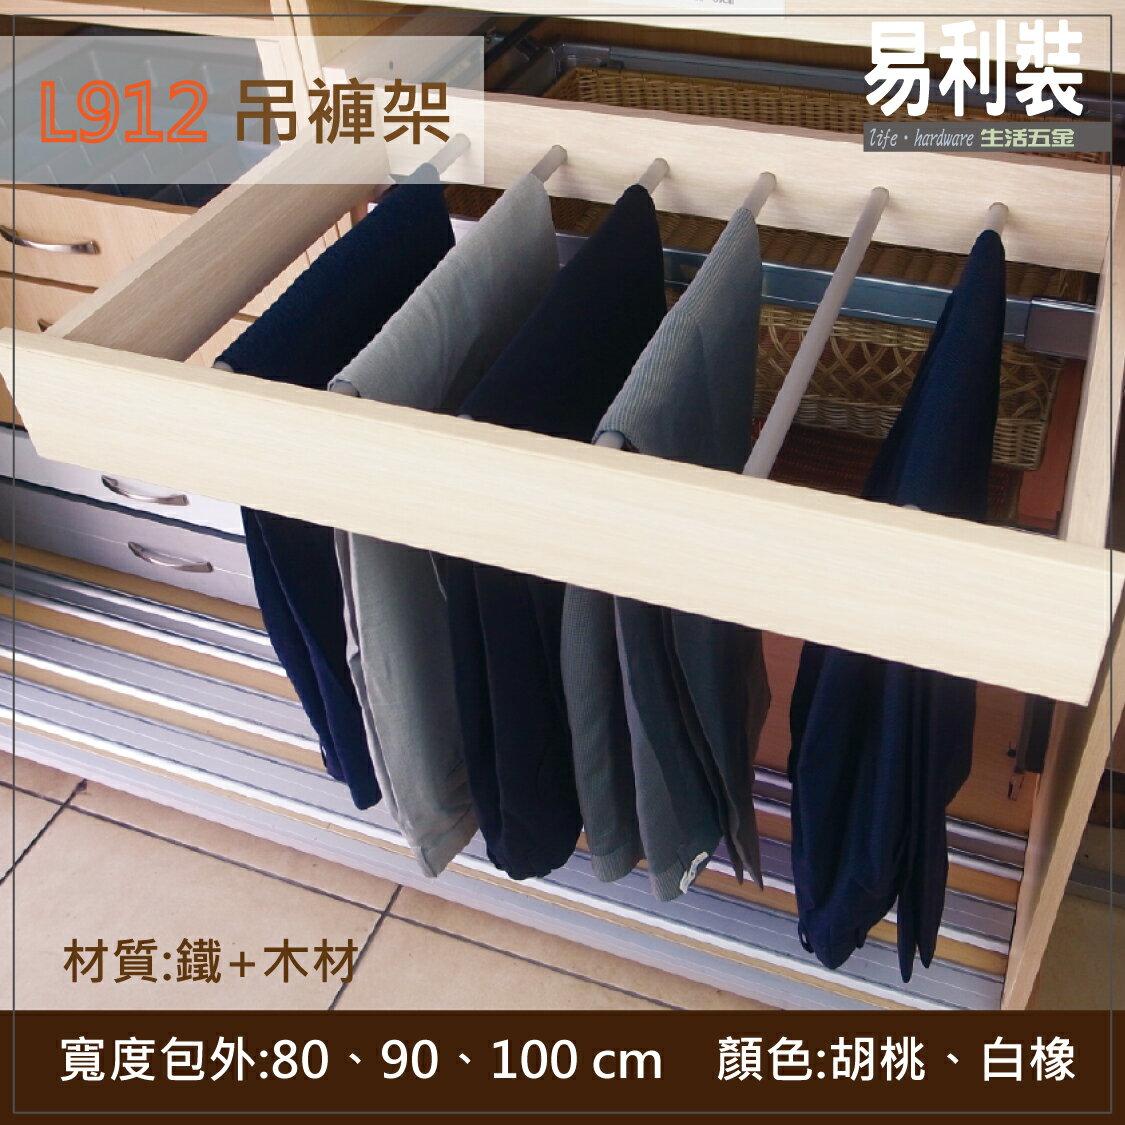 【 EASYCAN  】L912 吊褲架 易利裝生活五金 衣櫃 房間 臥房 衣櫃 小資族 辦公家具 系統家具 0